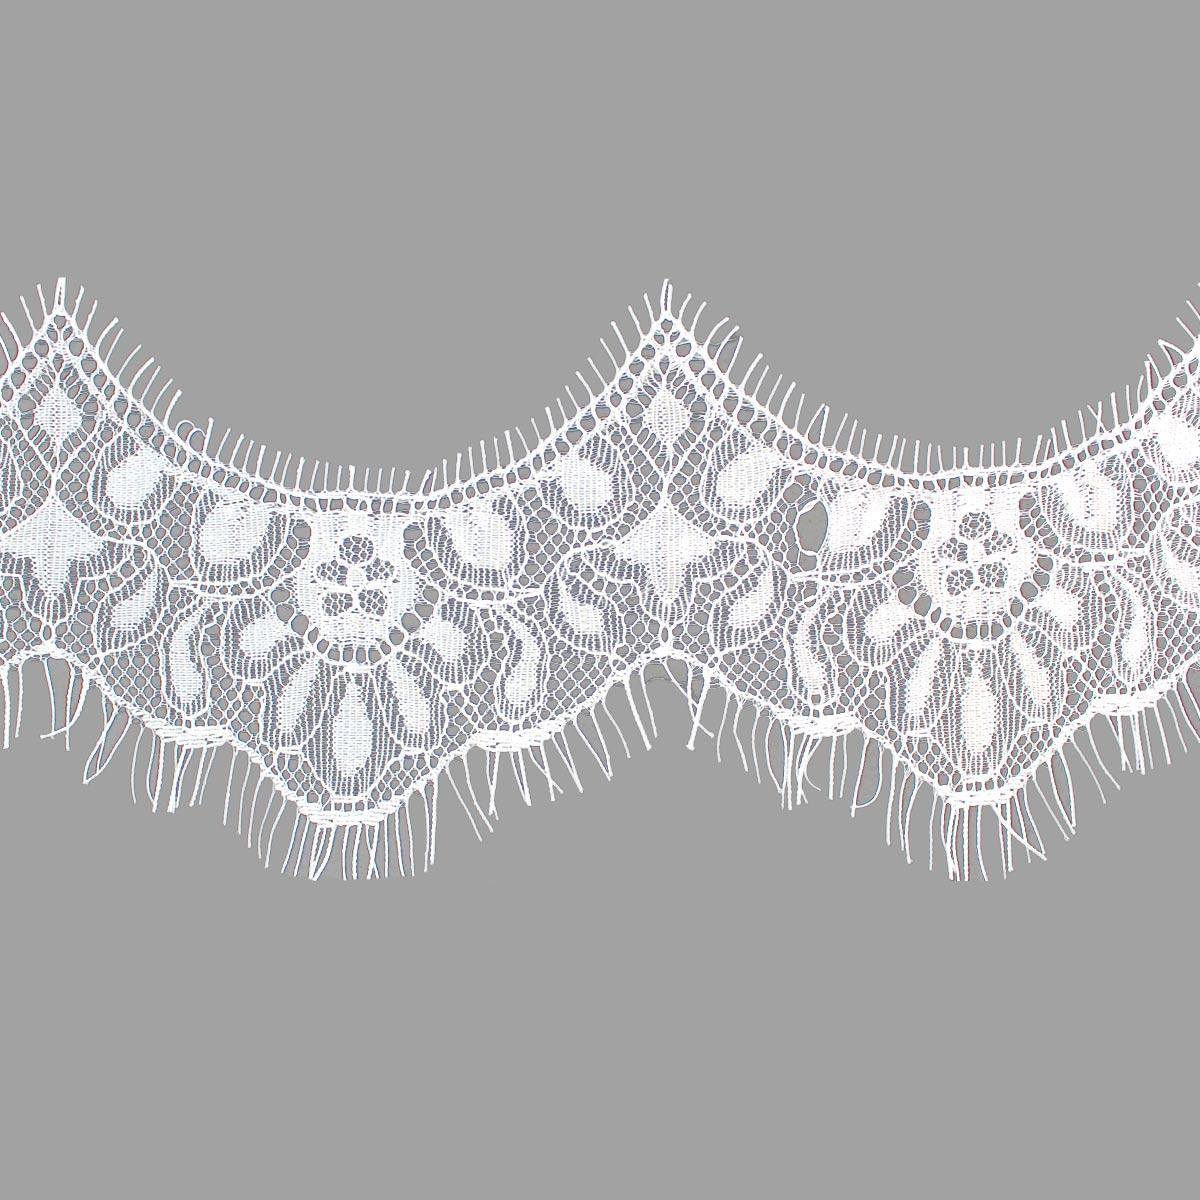 SJ026 Кружево 'Шантильи' на сетке 6,5см*3м, белый